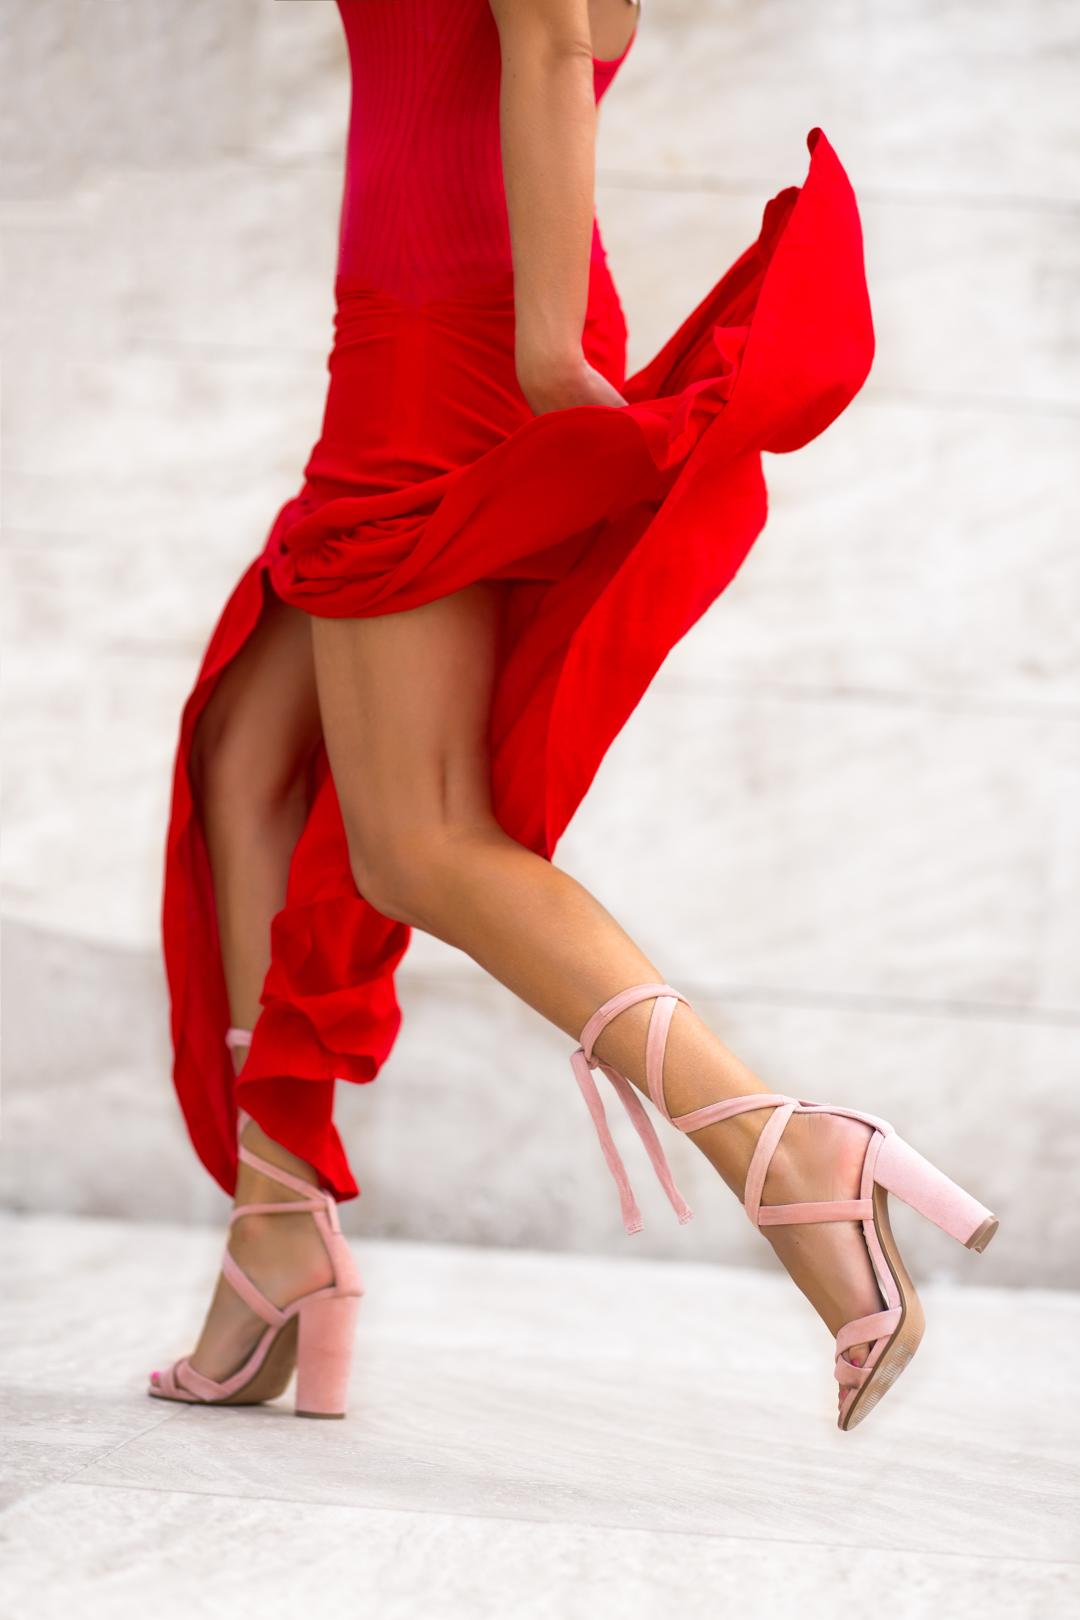 resized-pinkshoes-1